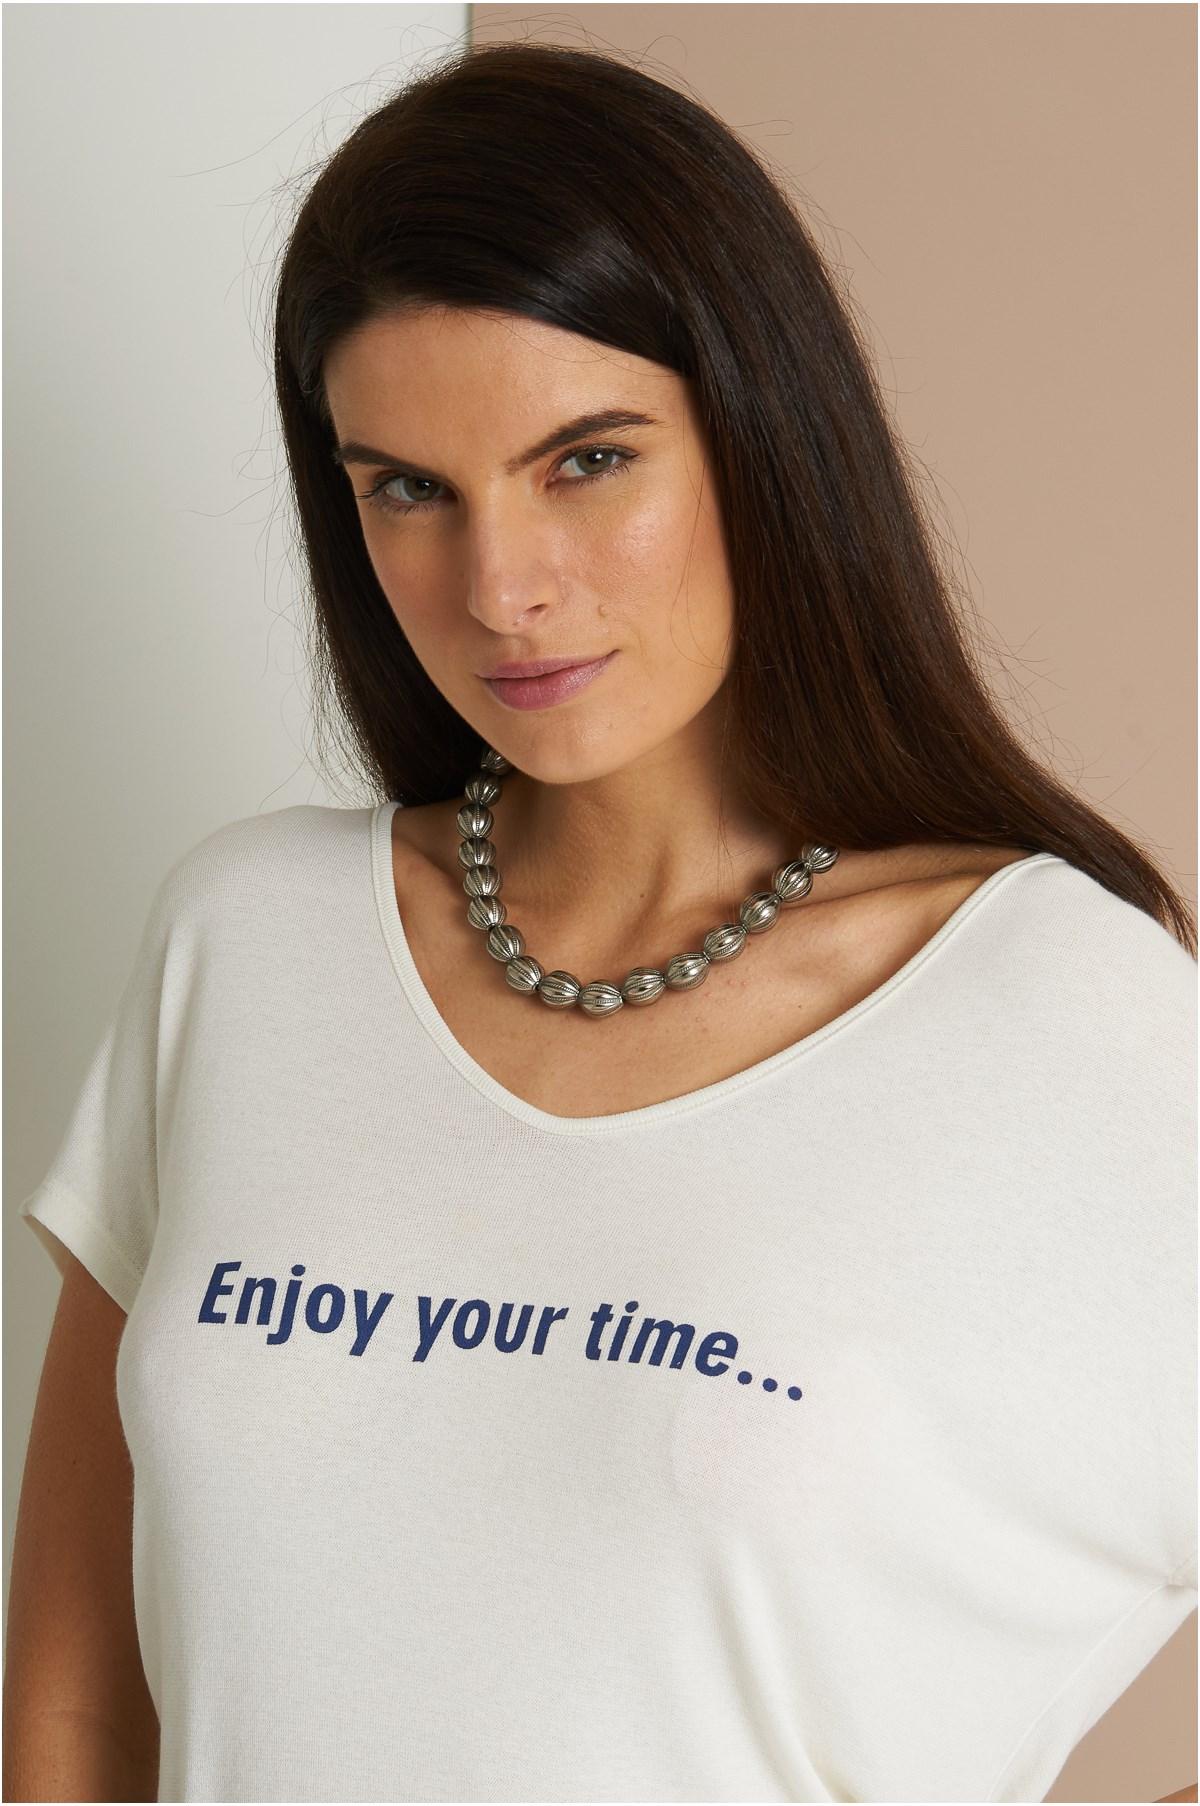 Blusa Malha Tricot Enjoy Your Time